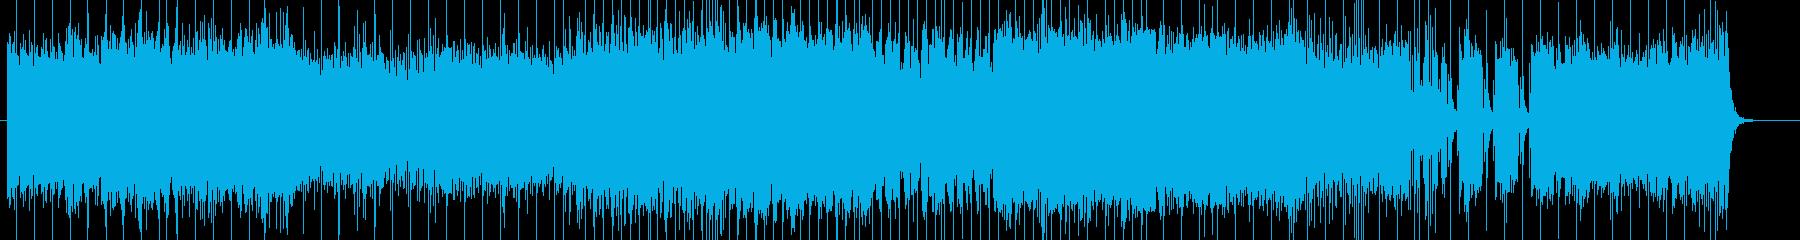 「HR/HM」「DARK系」BGM12の再生済みの波形